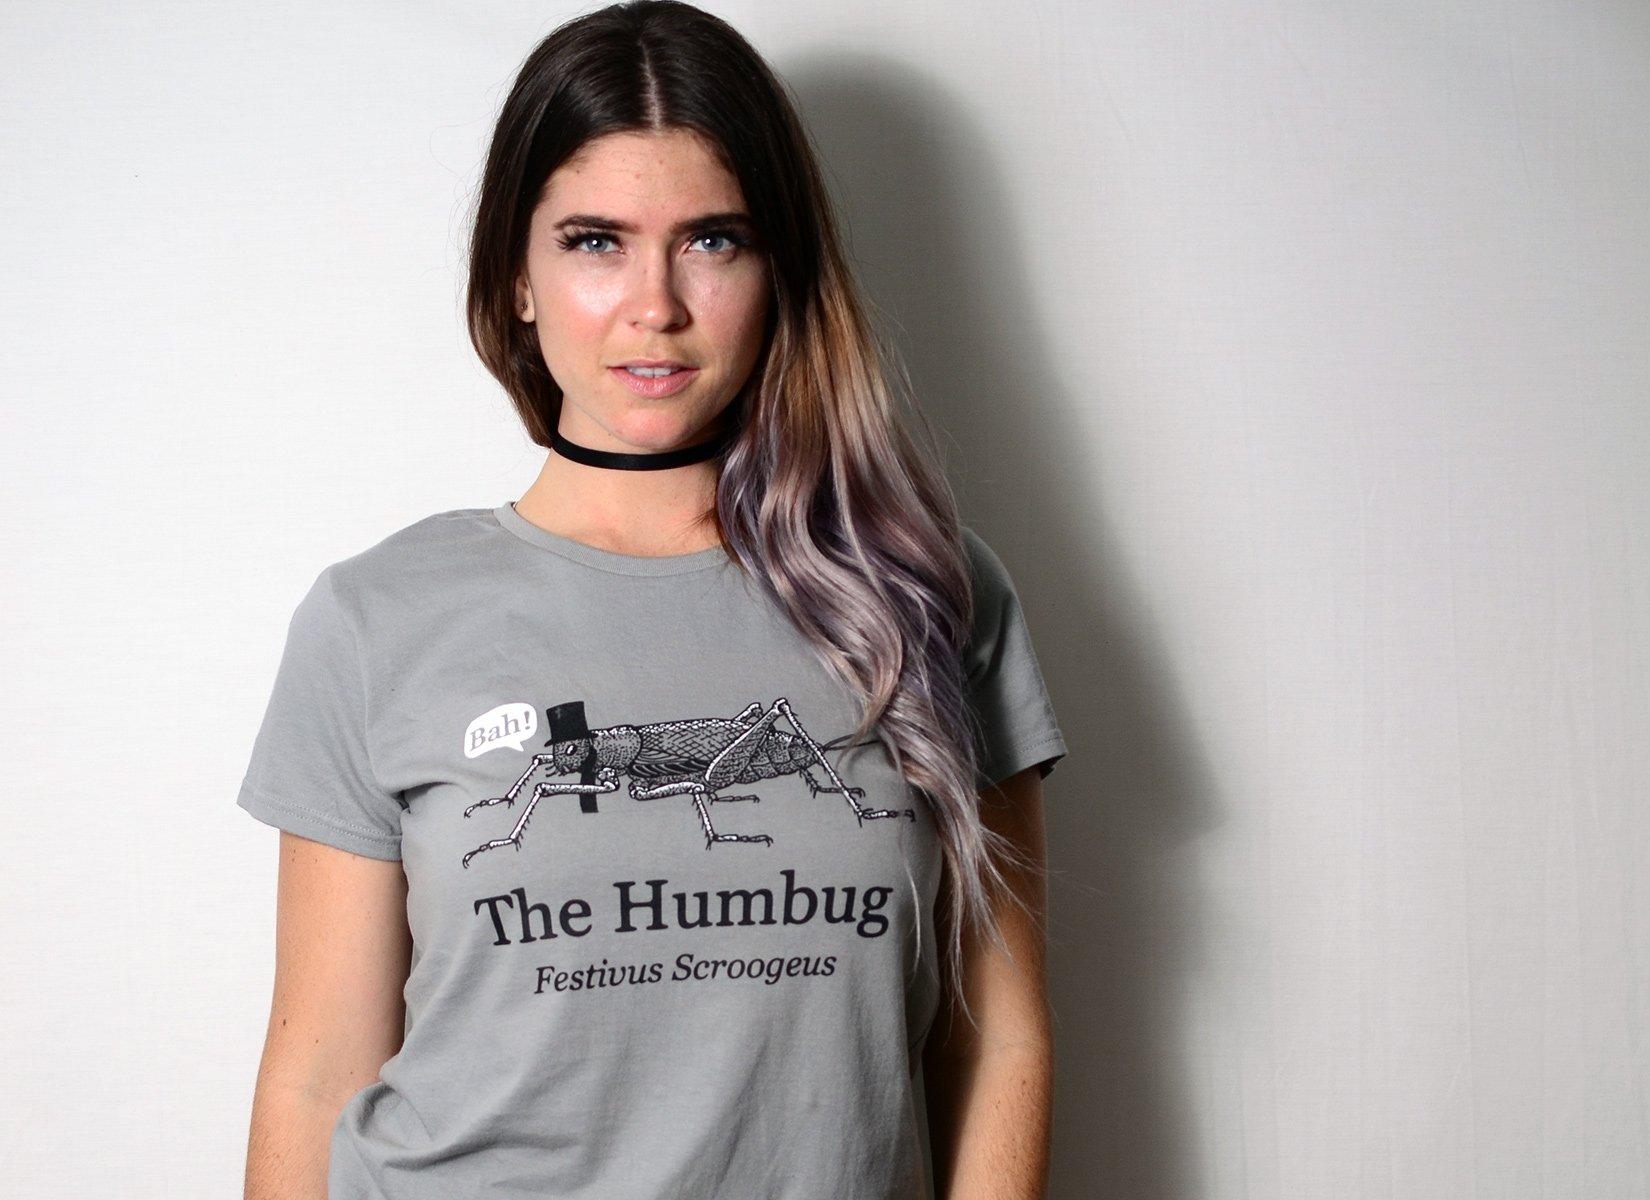 The Humbug on Womens T-Shirt